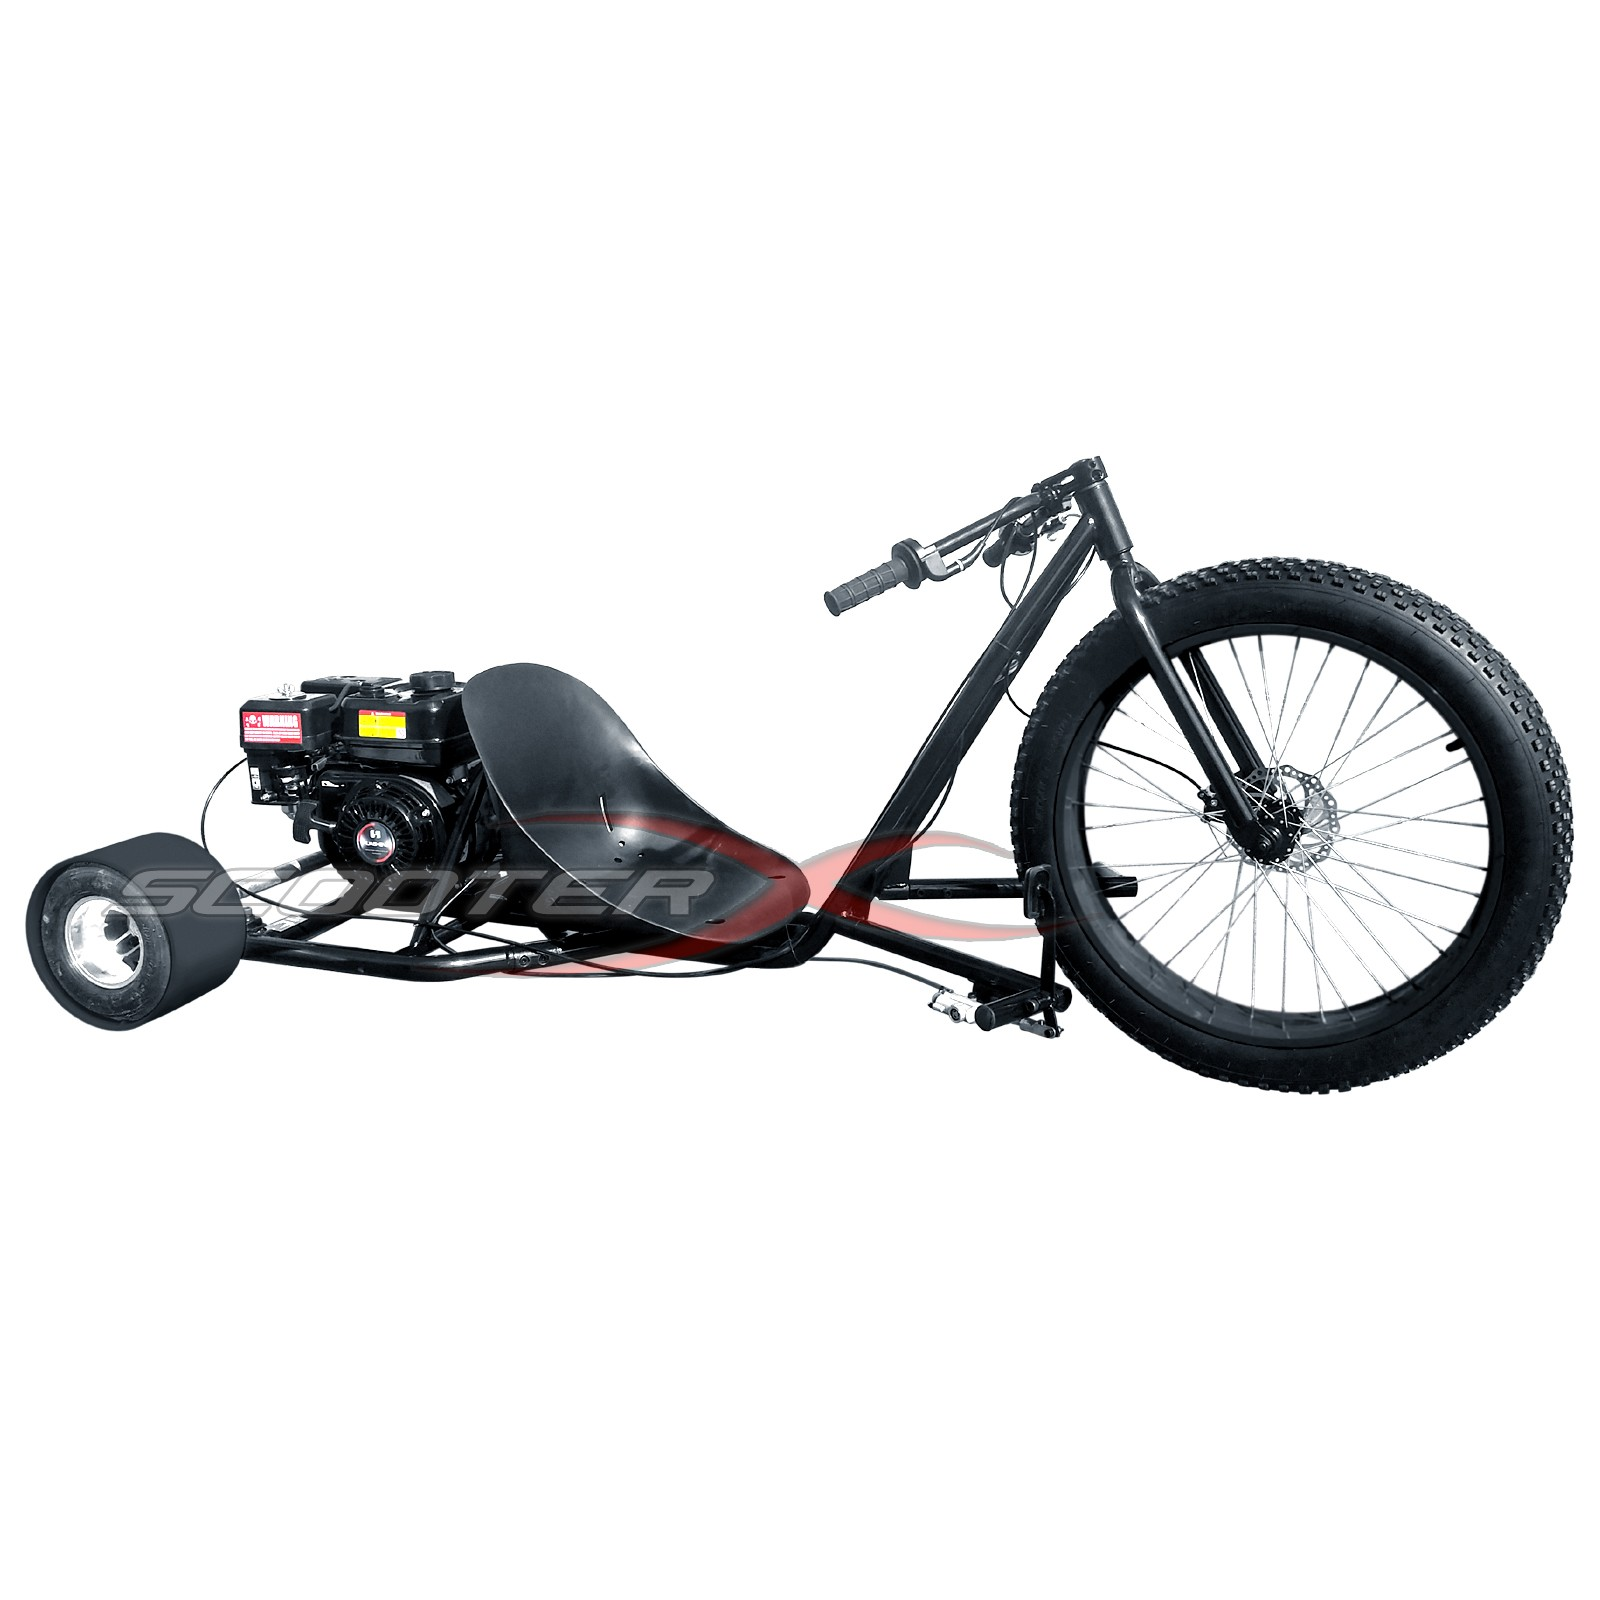 6 5hp gas powered scooterx drift trike aka big wheel 3 for Big wheel motor scooter